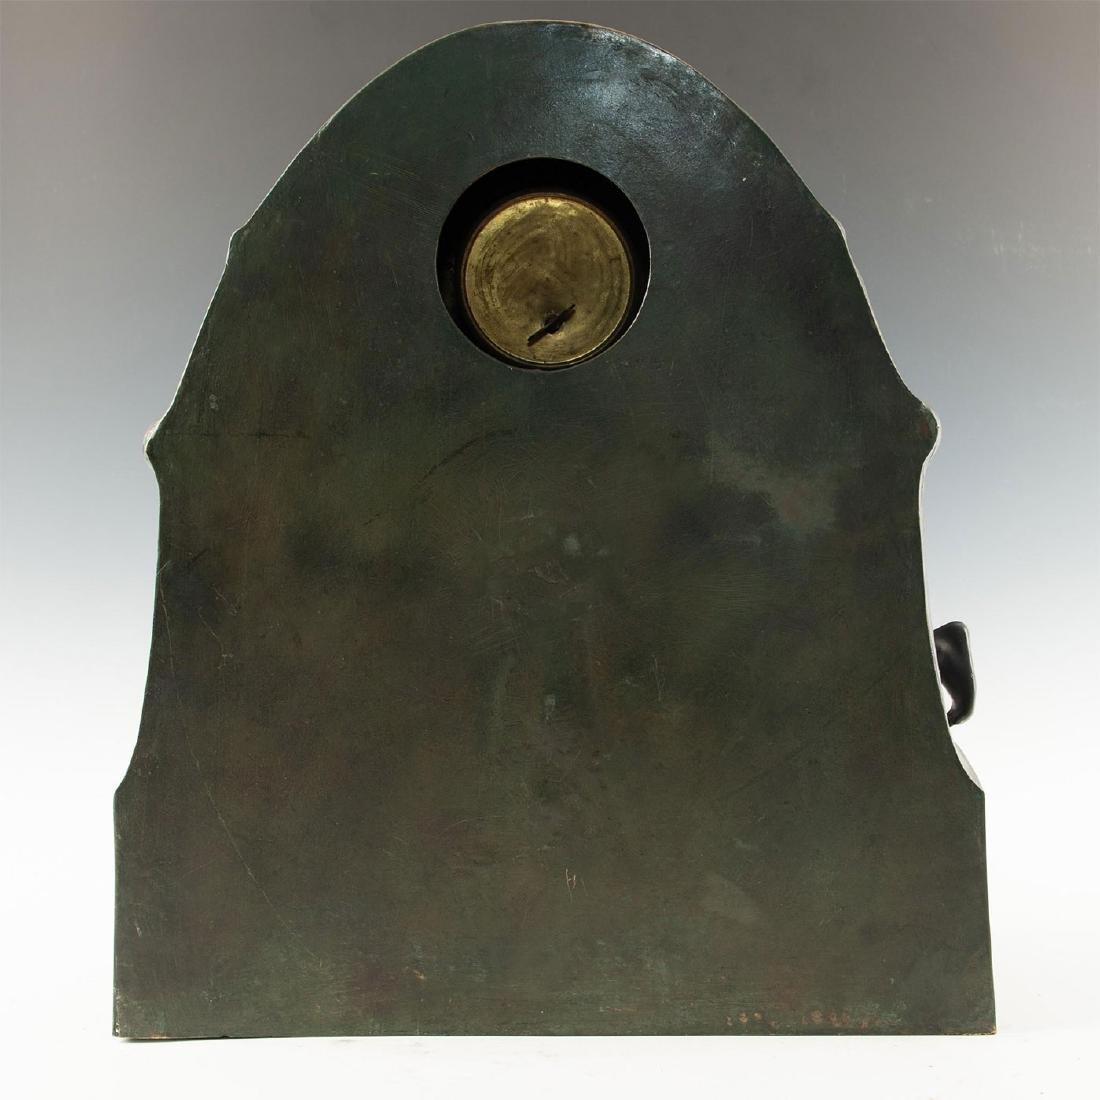 EARLY 20TH CENTURY ART NOUVEAU BRONZE CLOCK, AFTER - 7